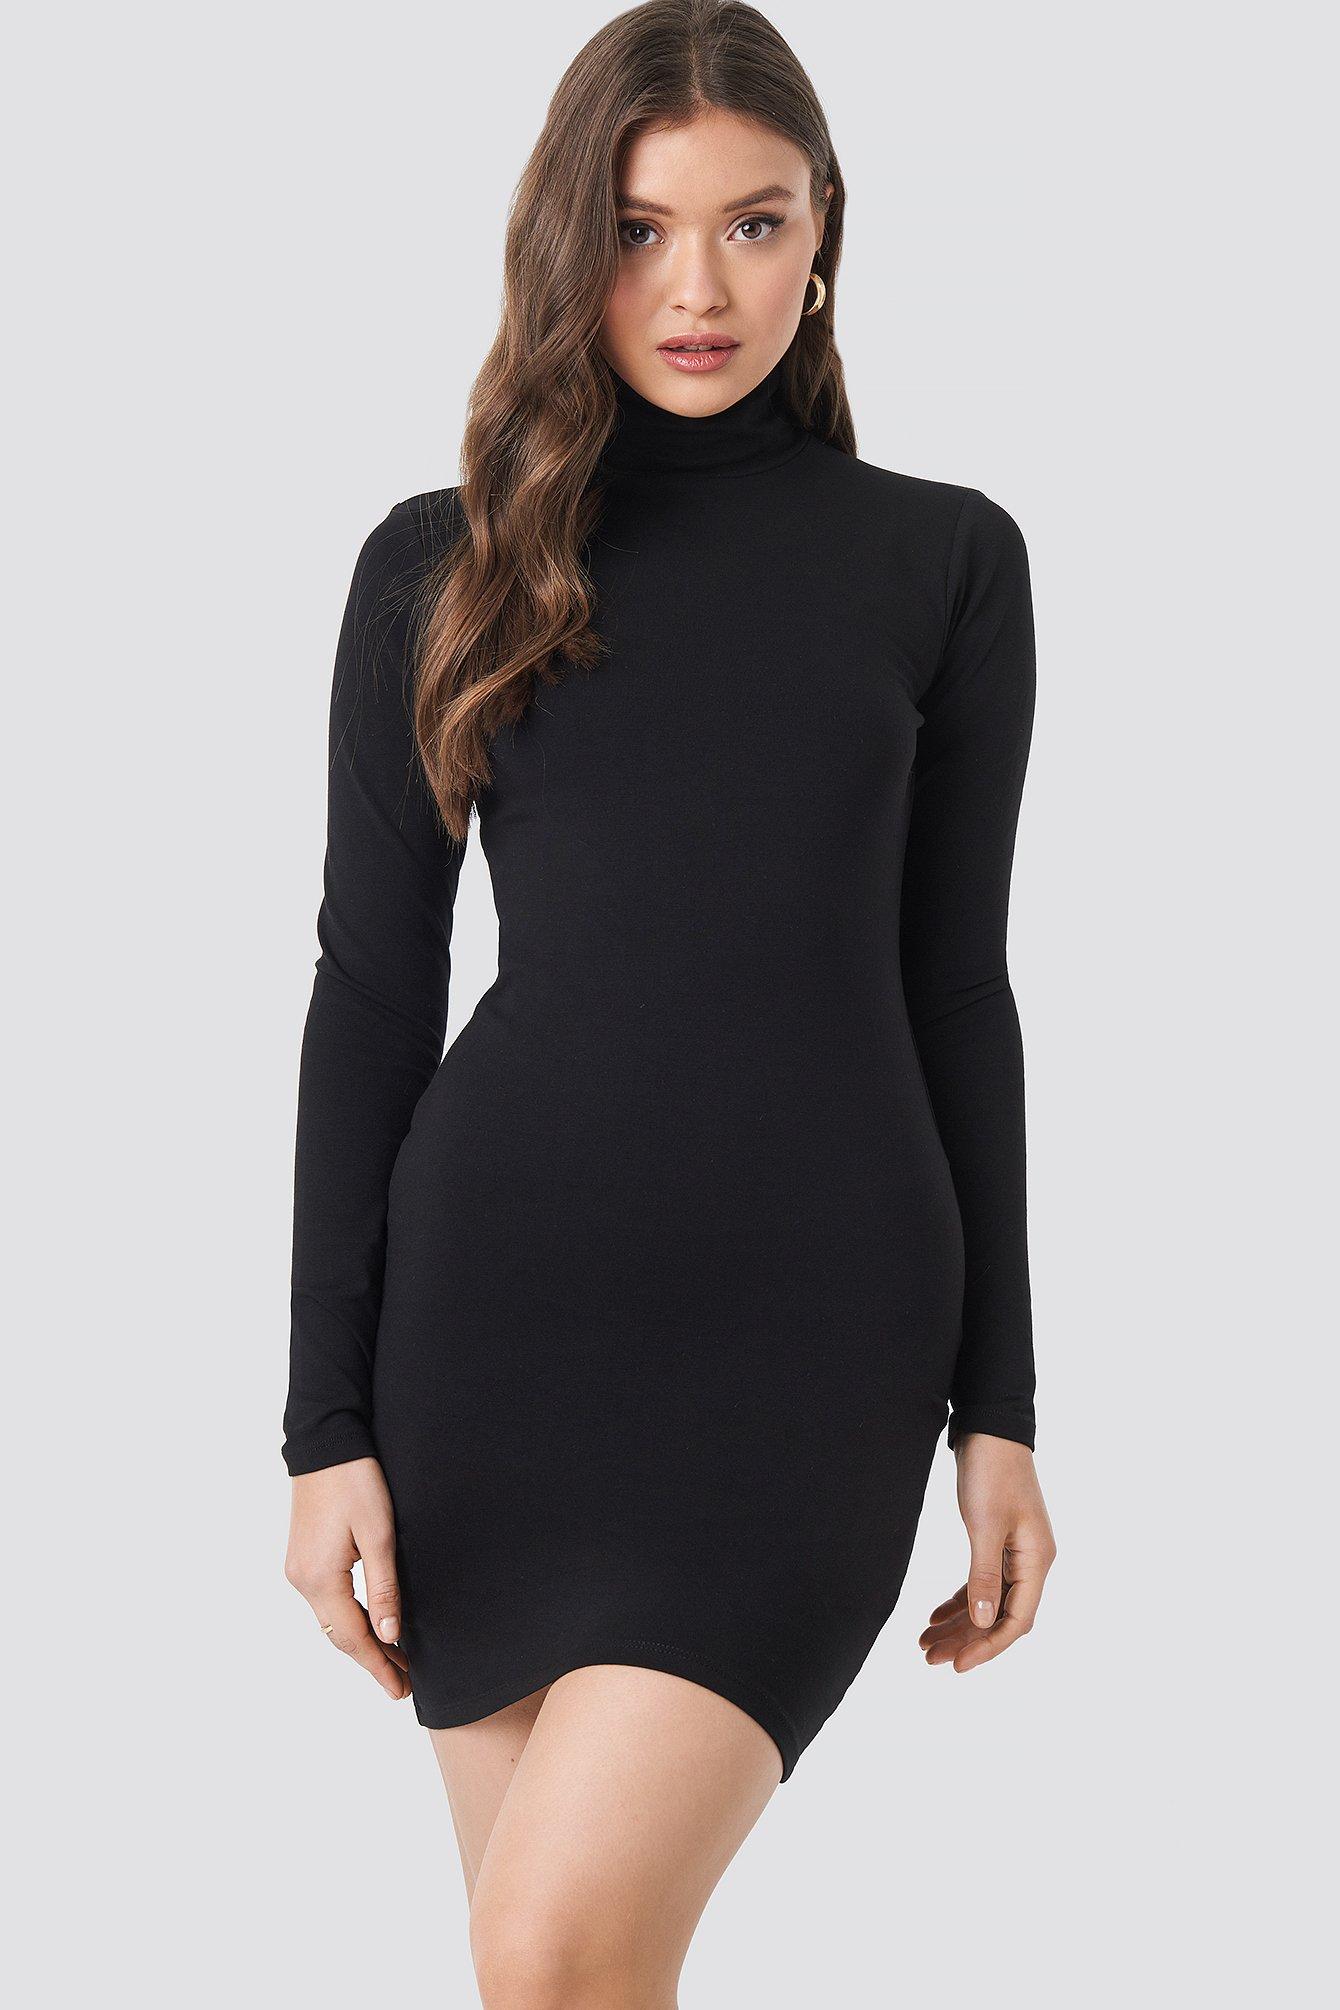 Polo Neck Dress Black Na Kd Com